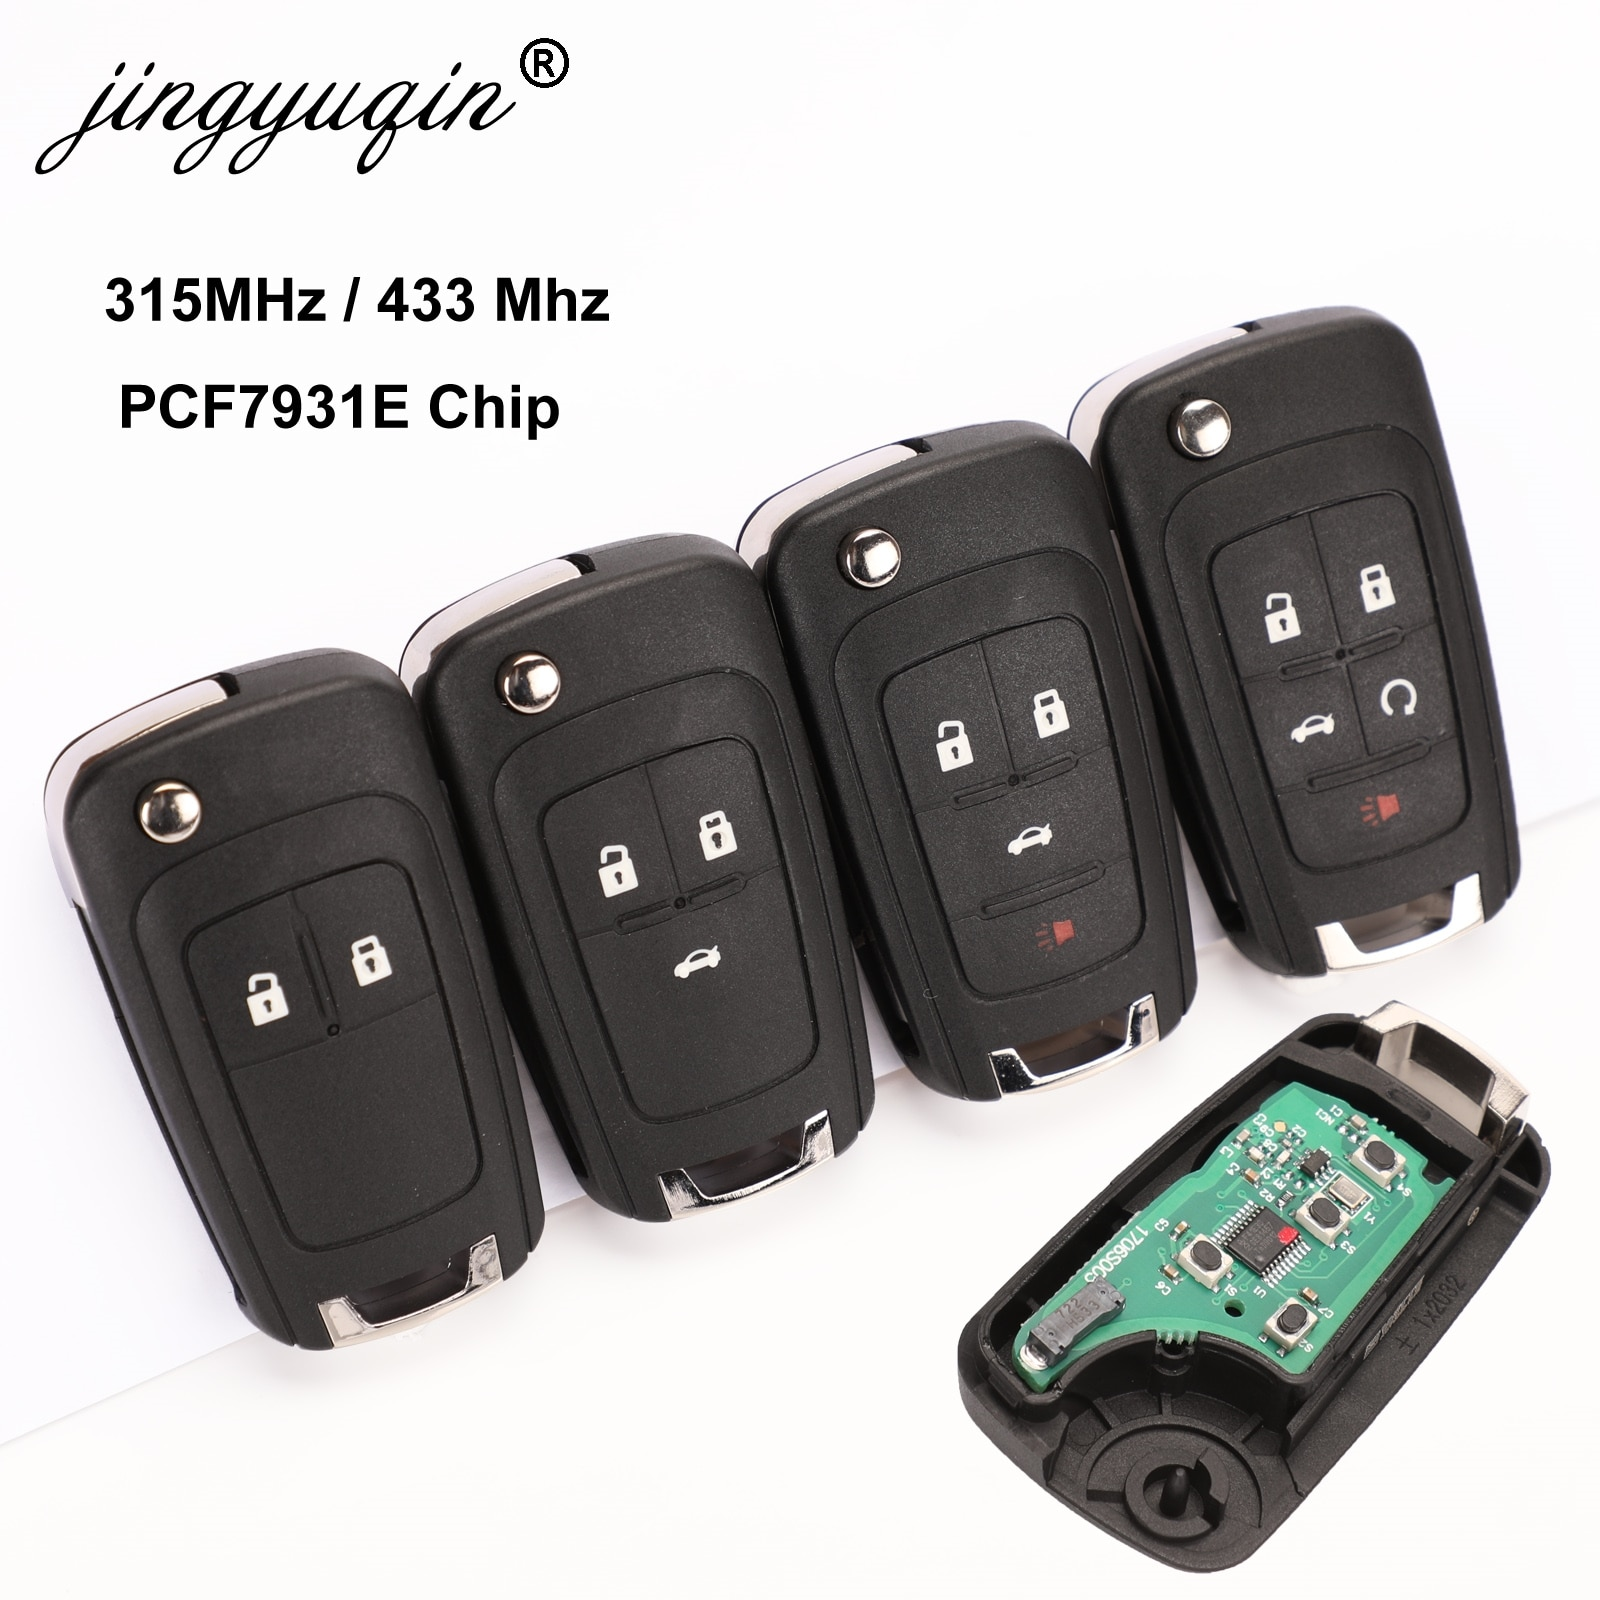 Jingyuqin 10 pçs/lote 2/3/4 botões de controle remoto fob flip dobrável chave para chevrolet lova vela aveo cruze 315/433mhz pcf7937e